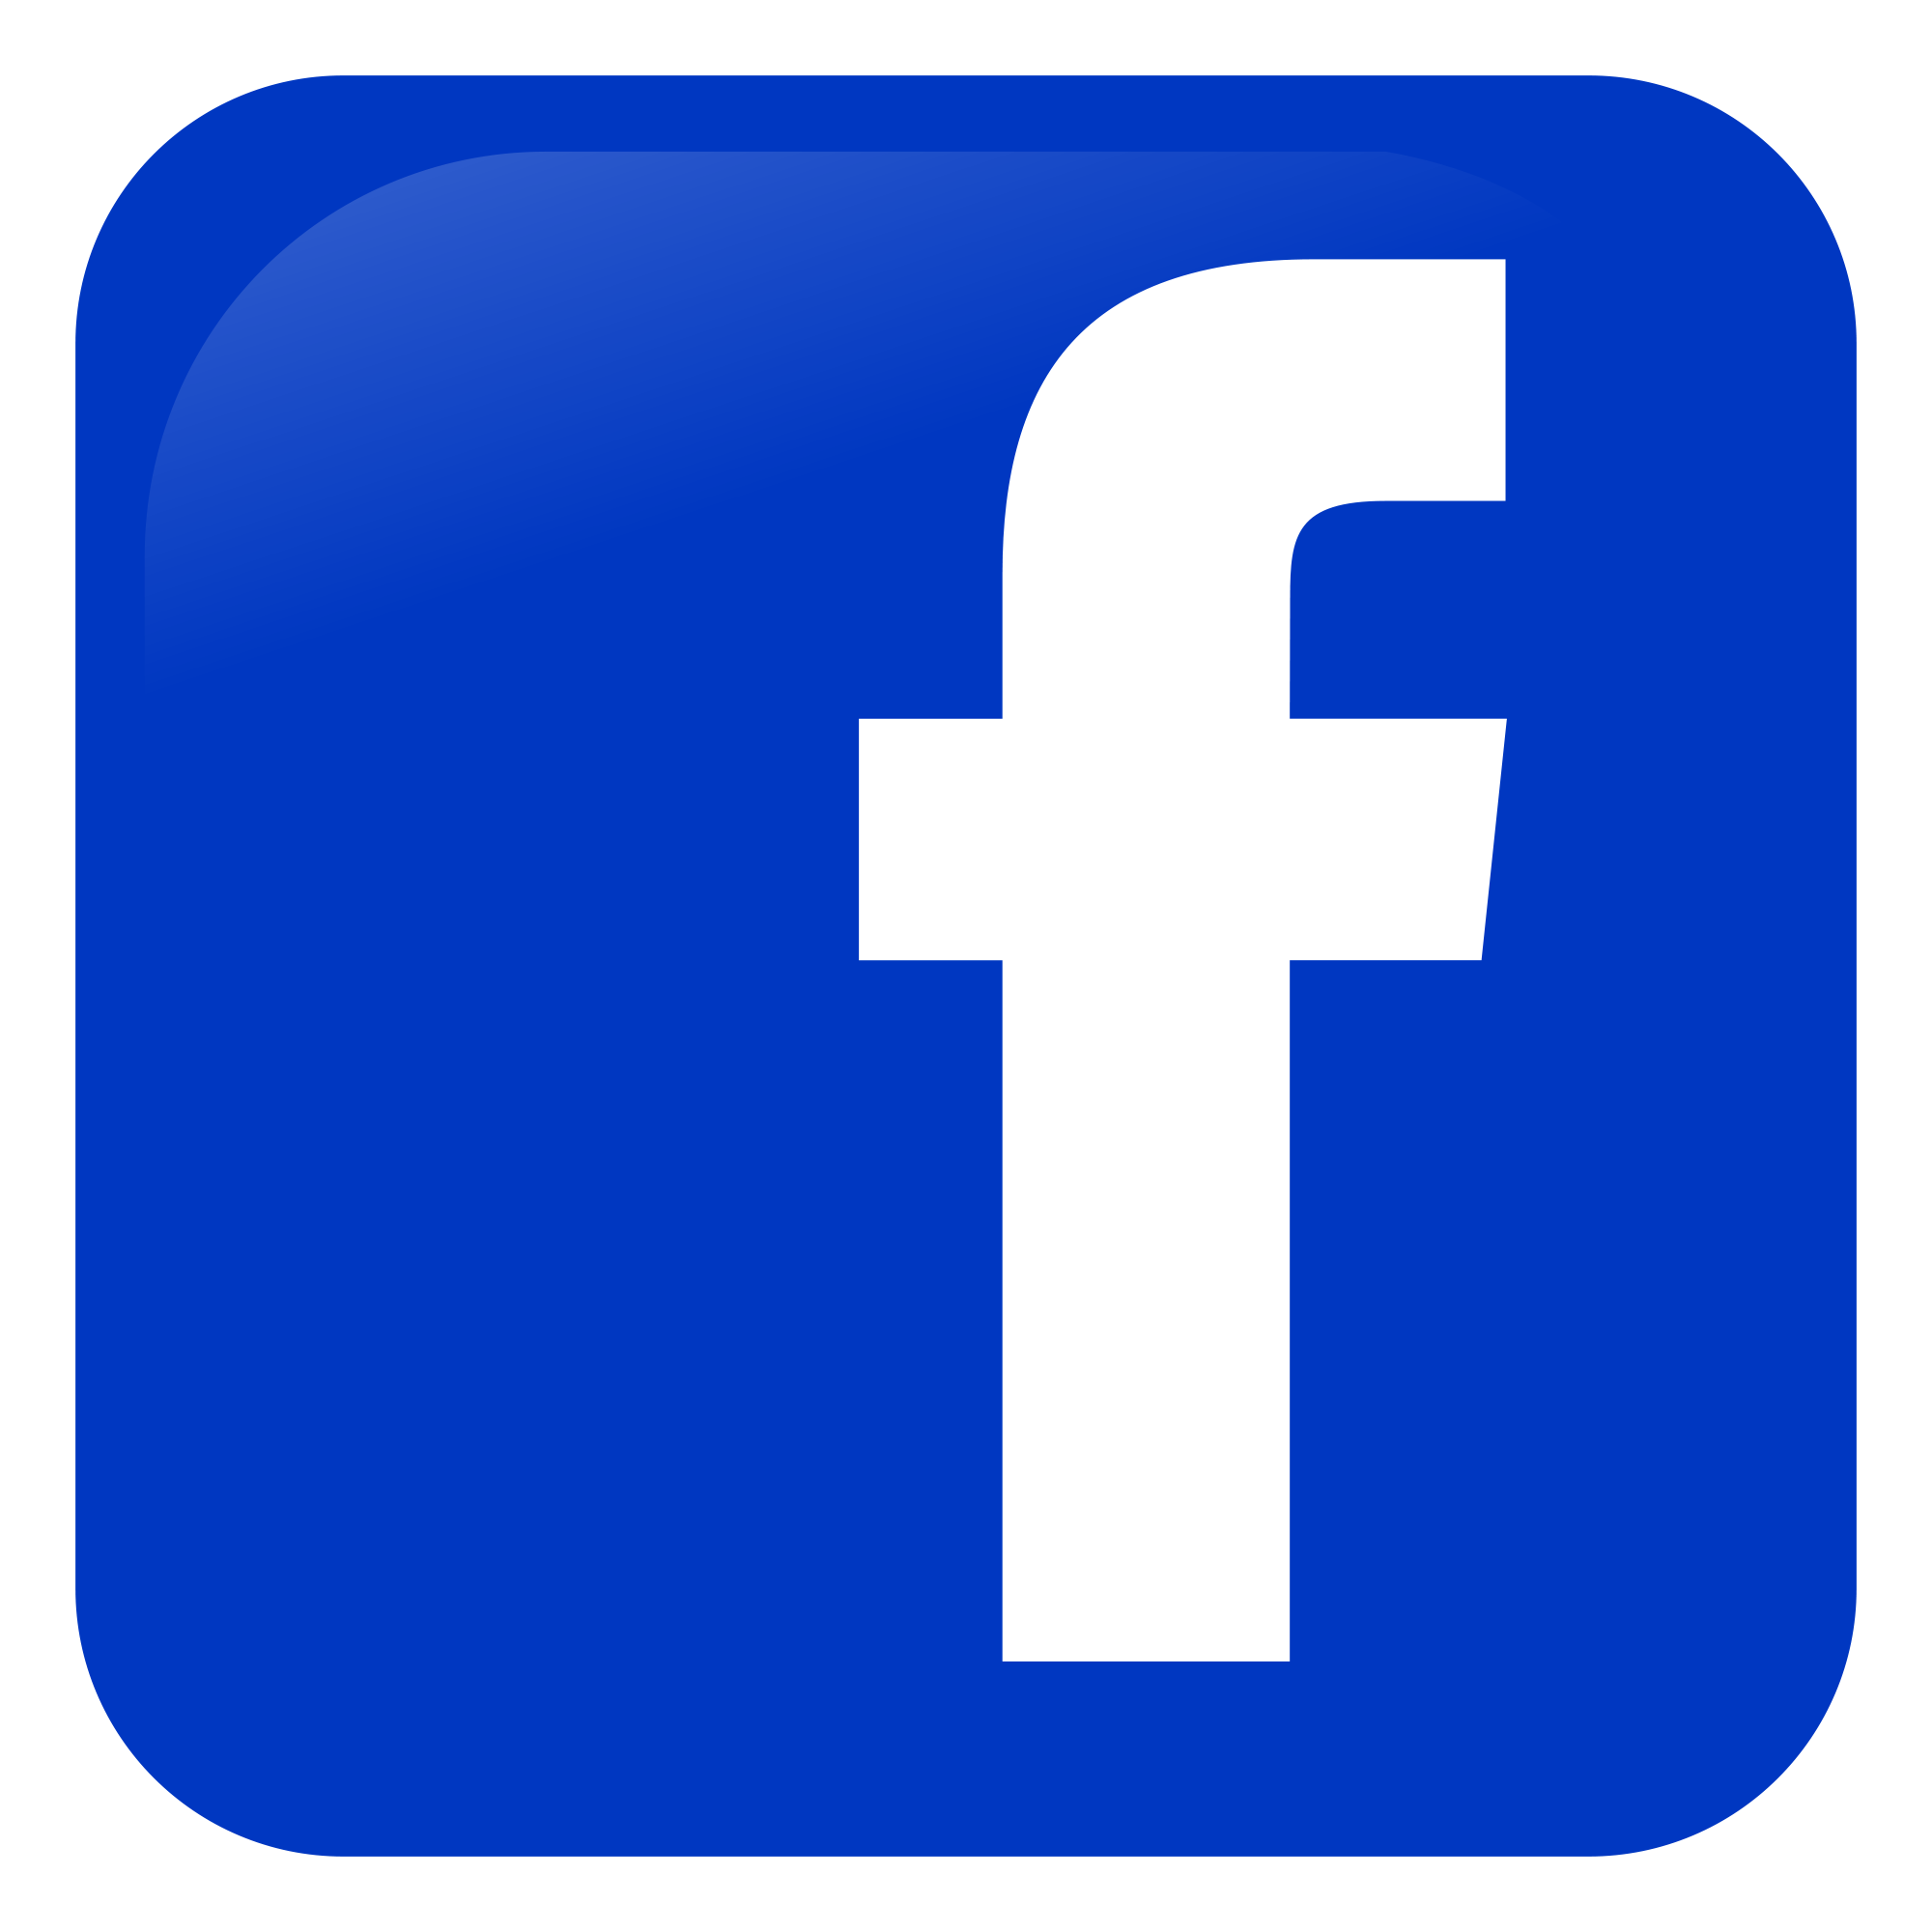 Facebook logo clipart png svg stock Facebook Logos PNG images free download svg stock